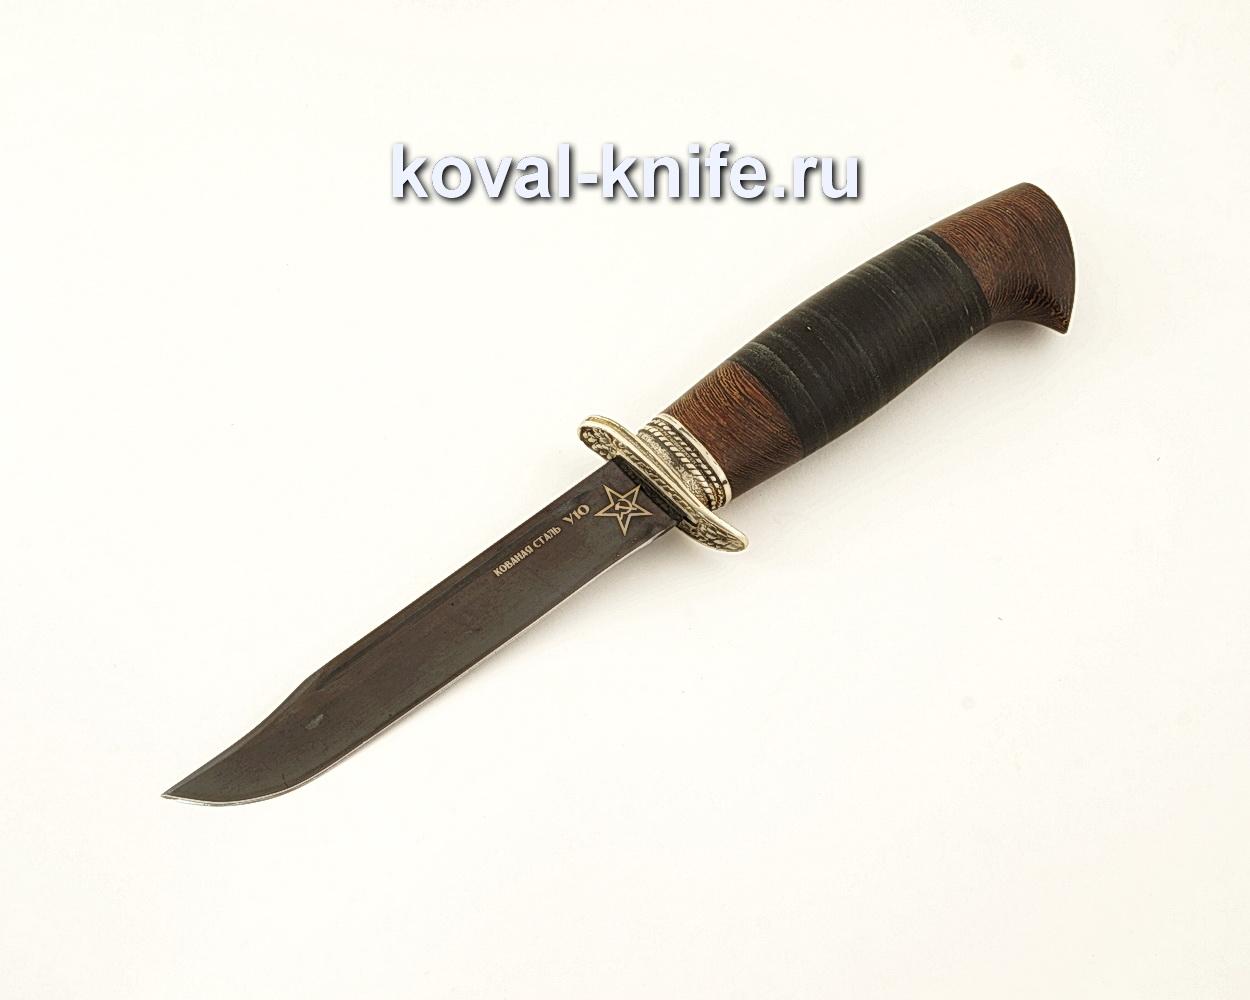 Нож Штрафбат – реплика ножа НР40 из кованой стали У10 с рукоятью из кожи  A619